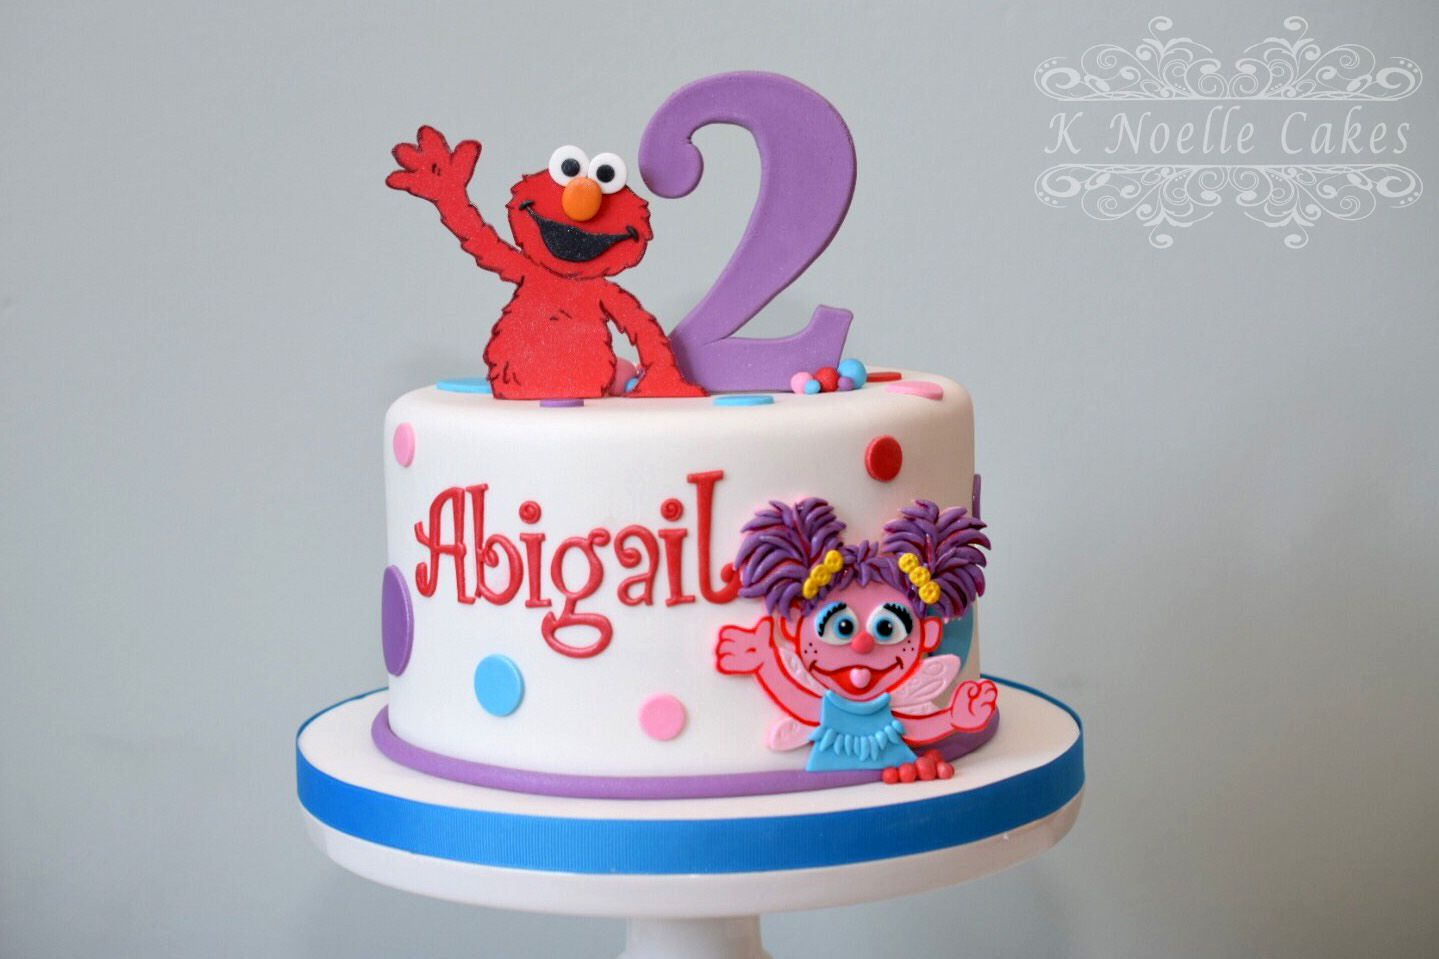 Sesame Street Elmo Abby Cake By K Noelle Cakes Elmo Birthday